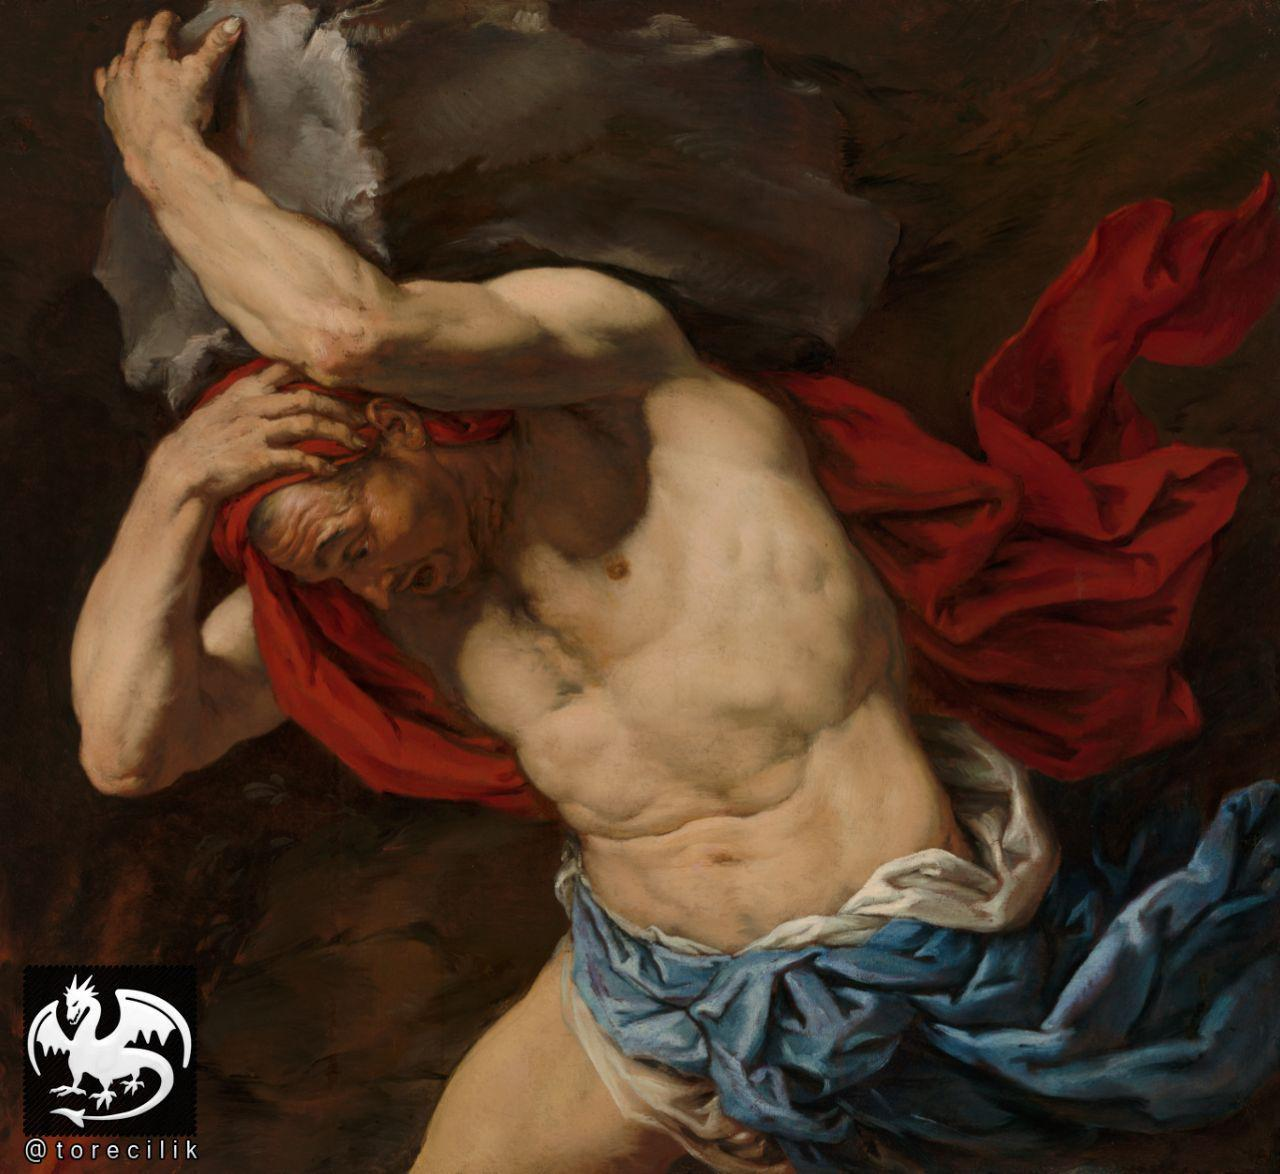 سیزیف: پادشاه حیله گر